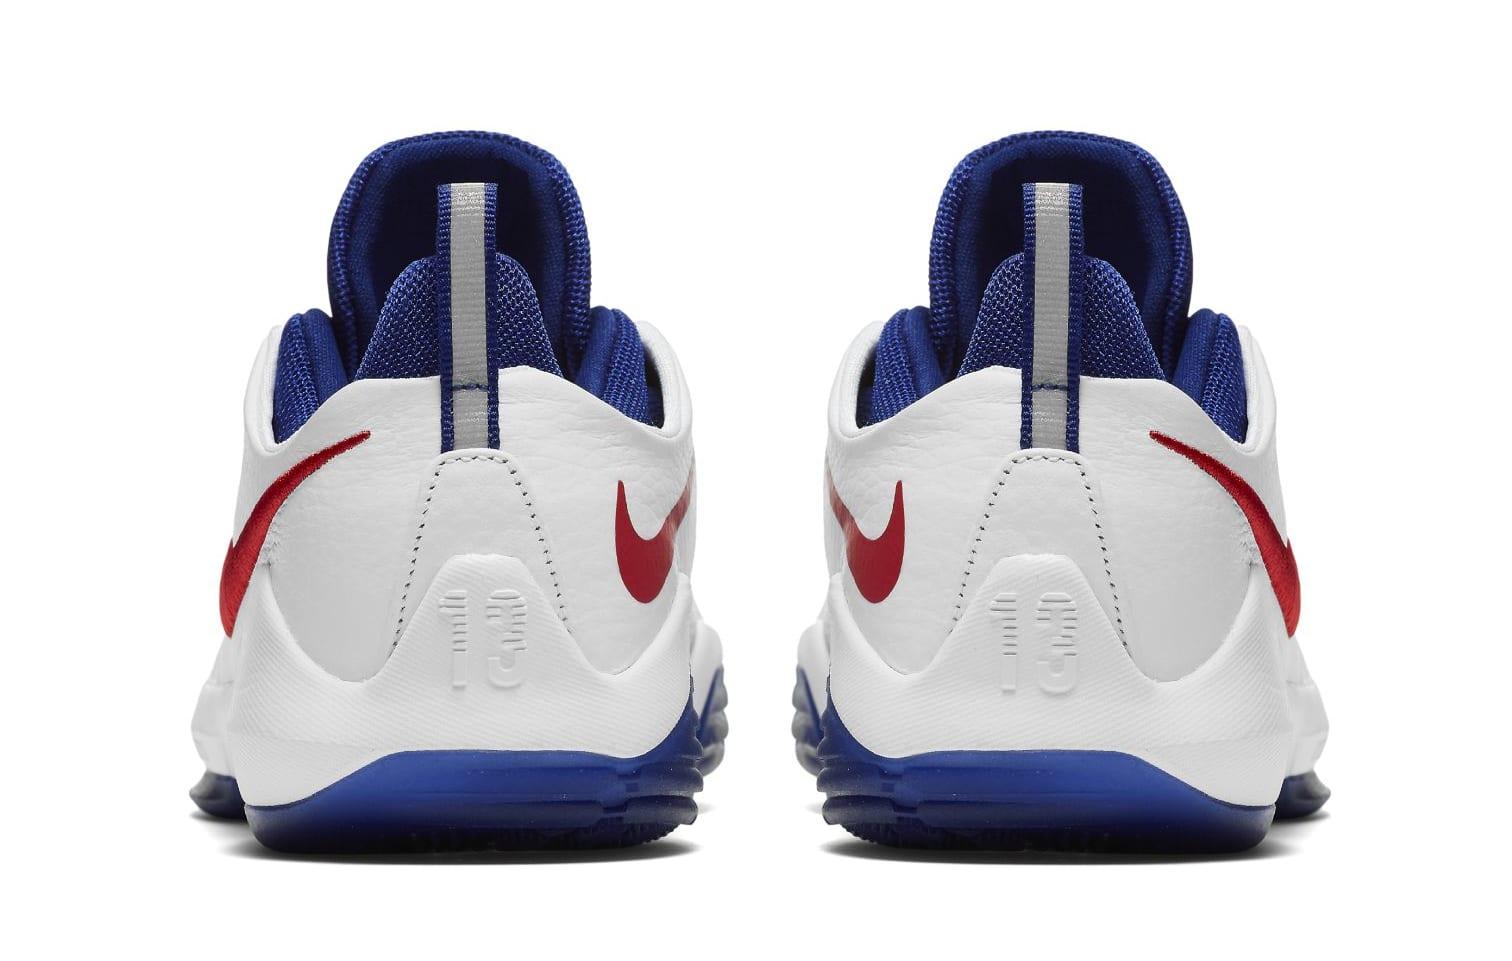 Nike PG 1 GS White/University Red-Deep Royal Blue (Heel)